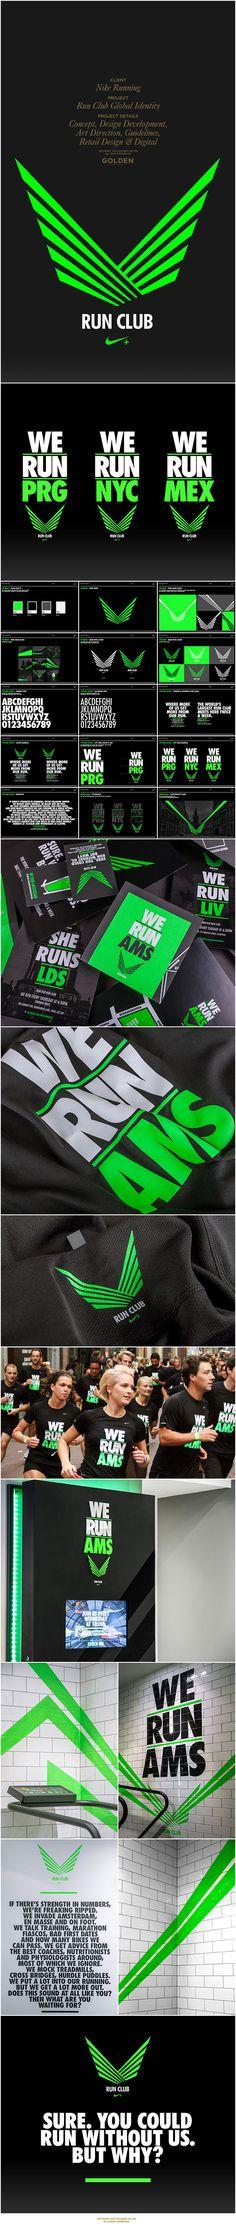 Nike Run Club on Behance